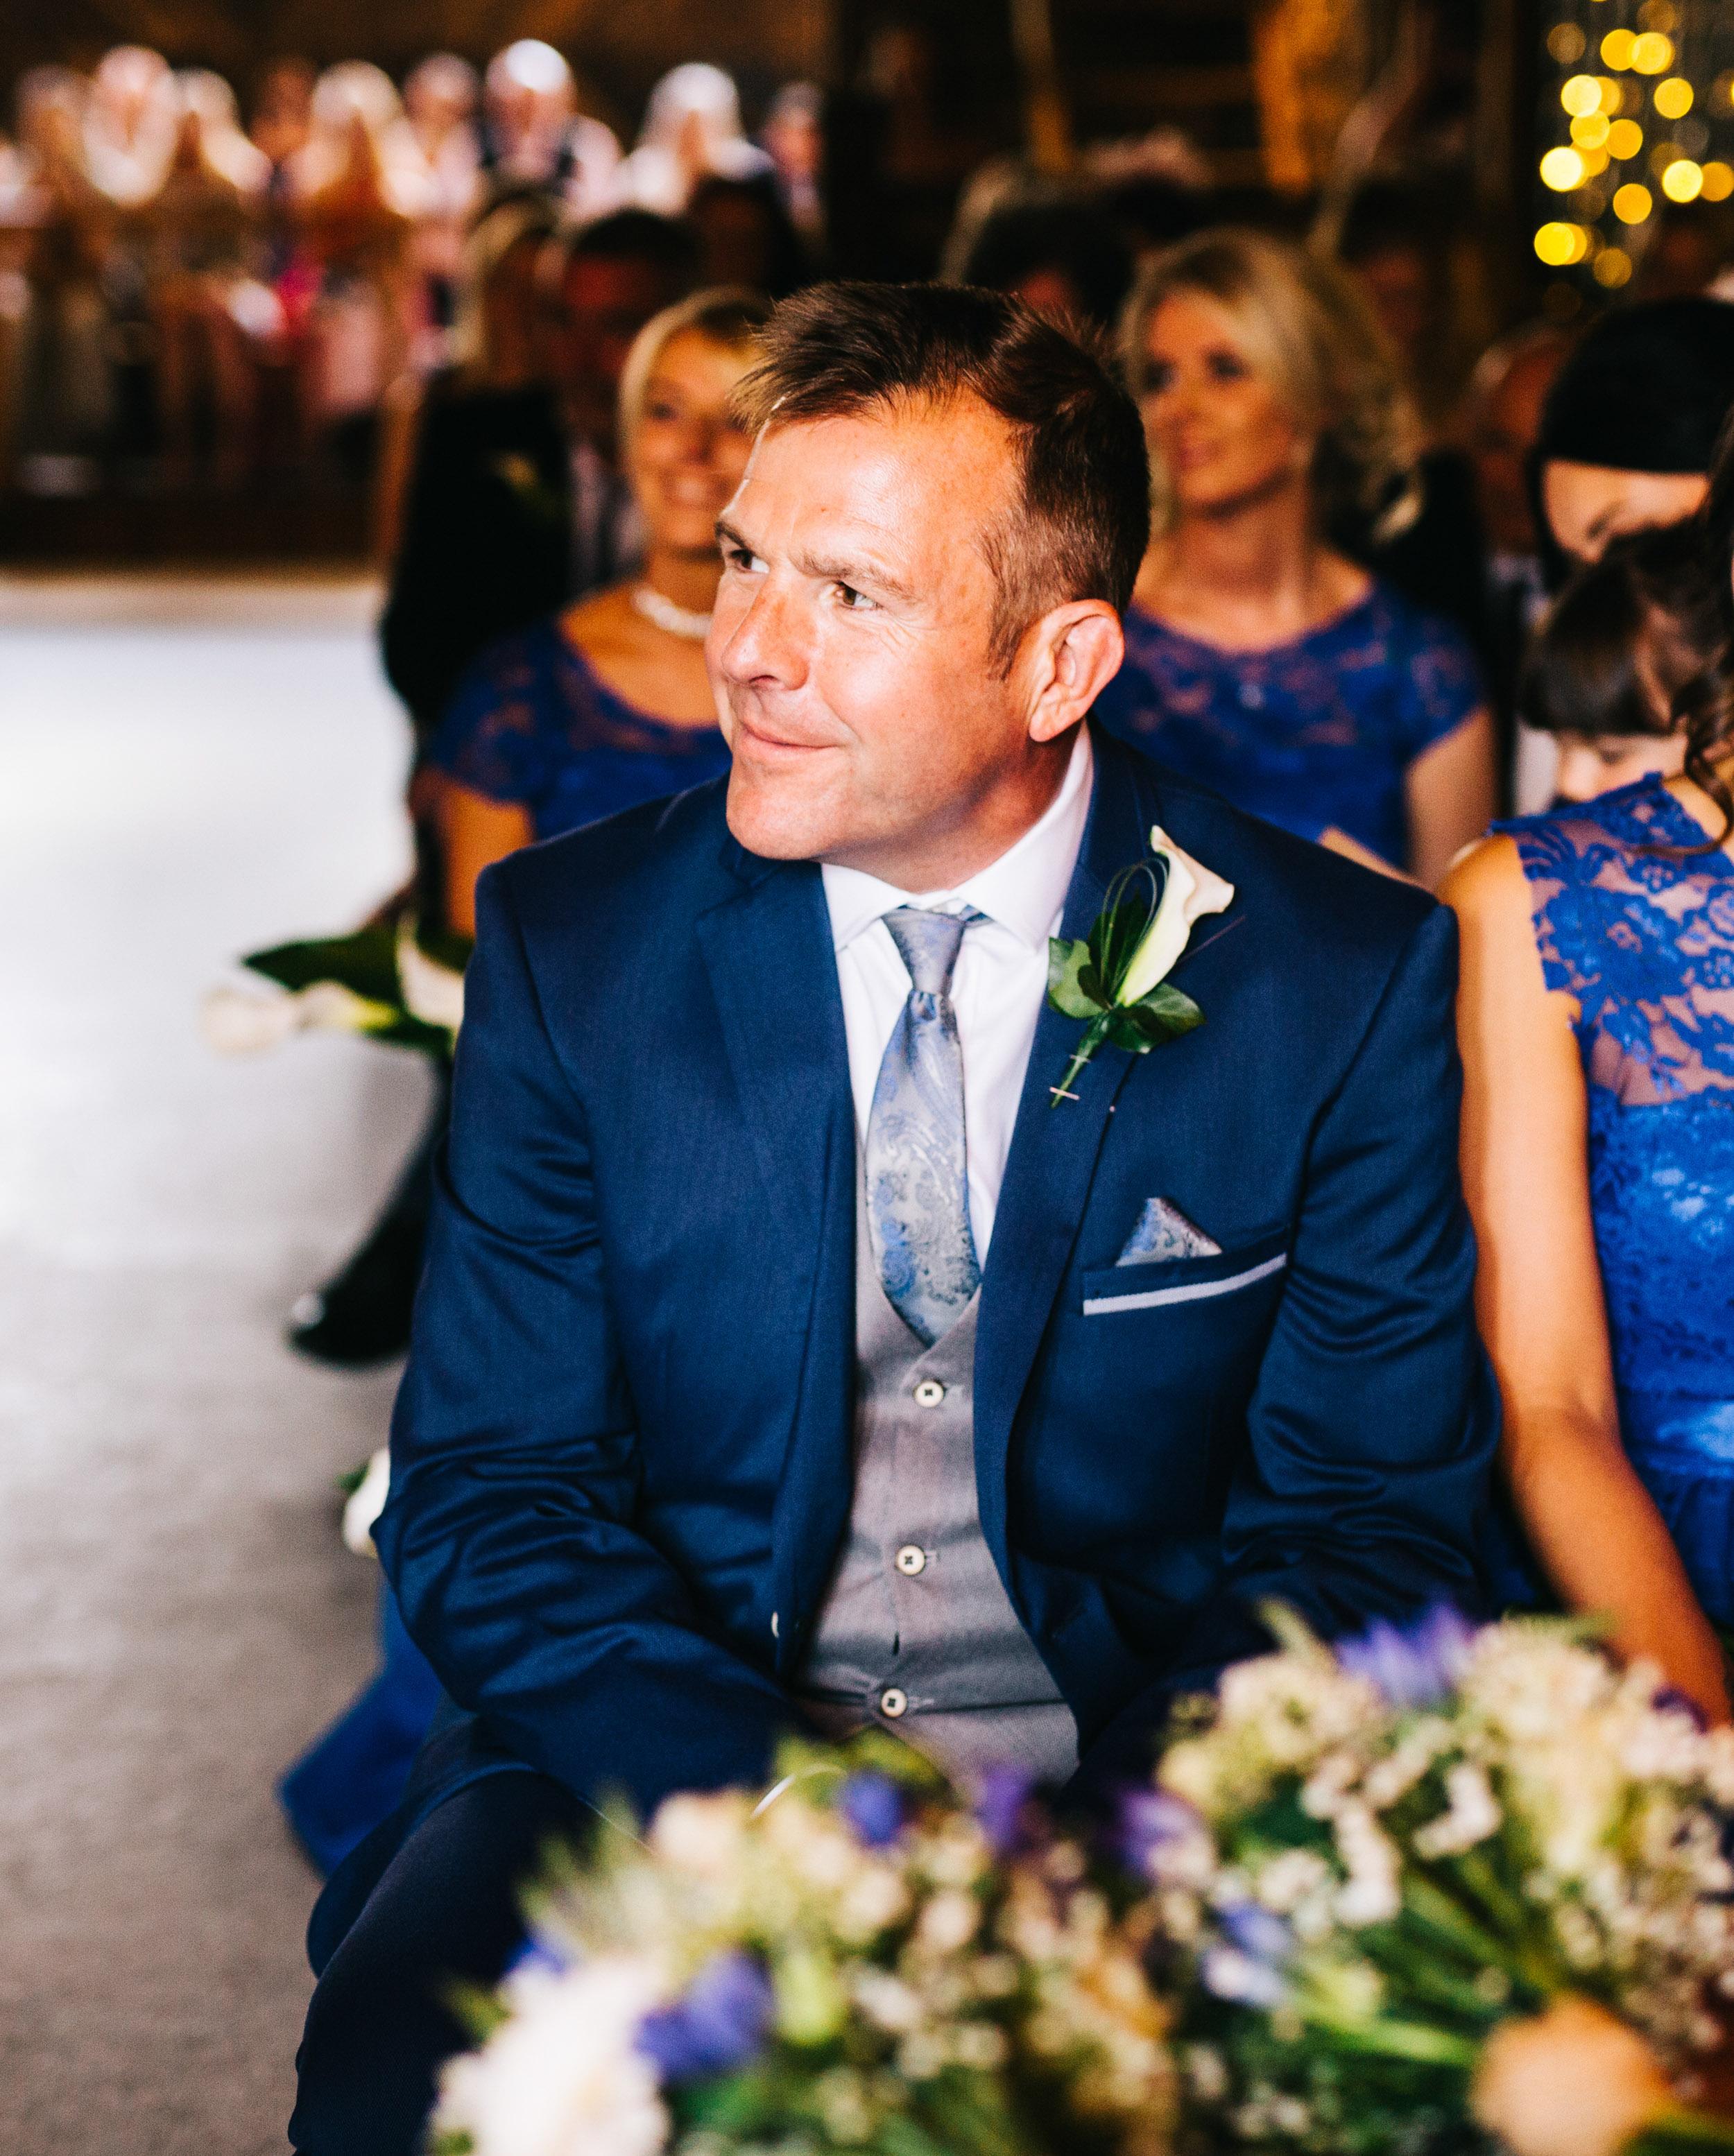 Cheshire wedding photographer - barn wedding